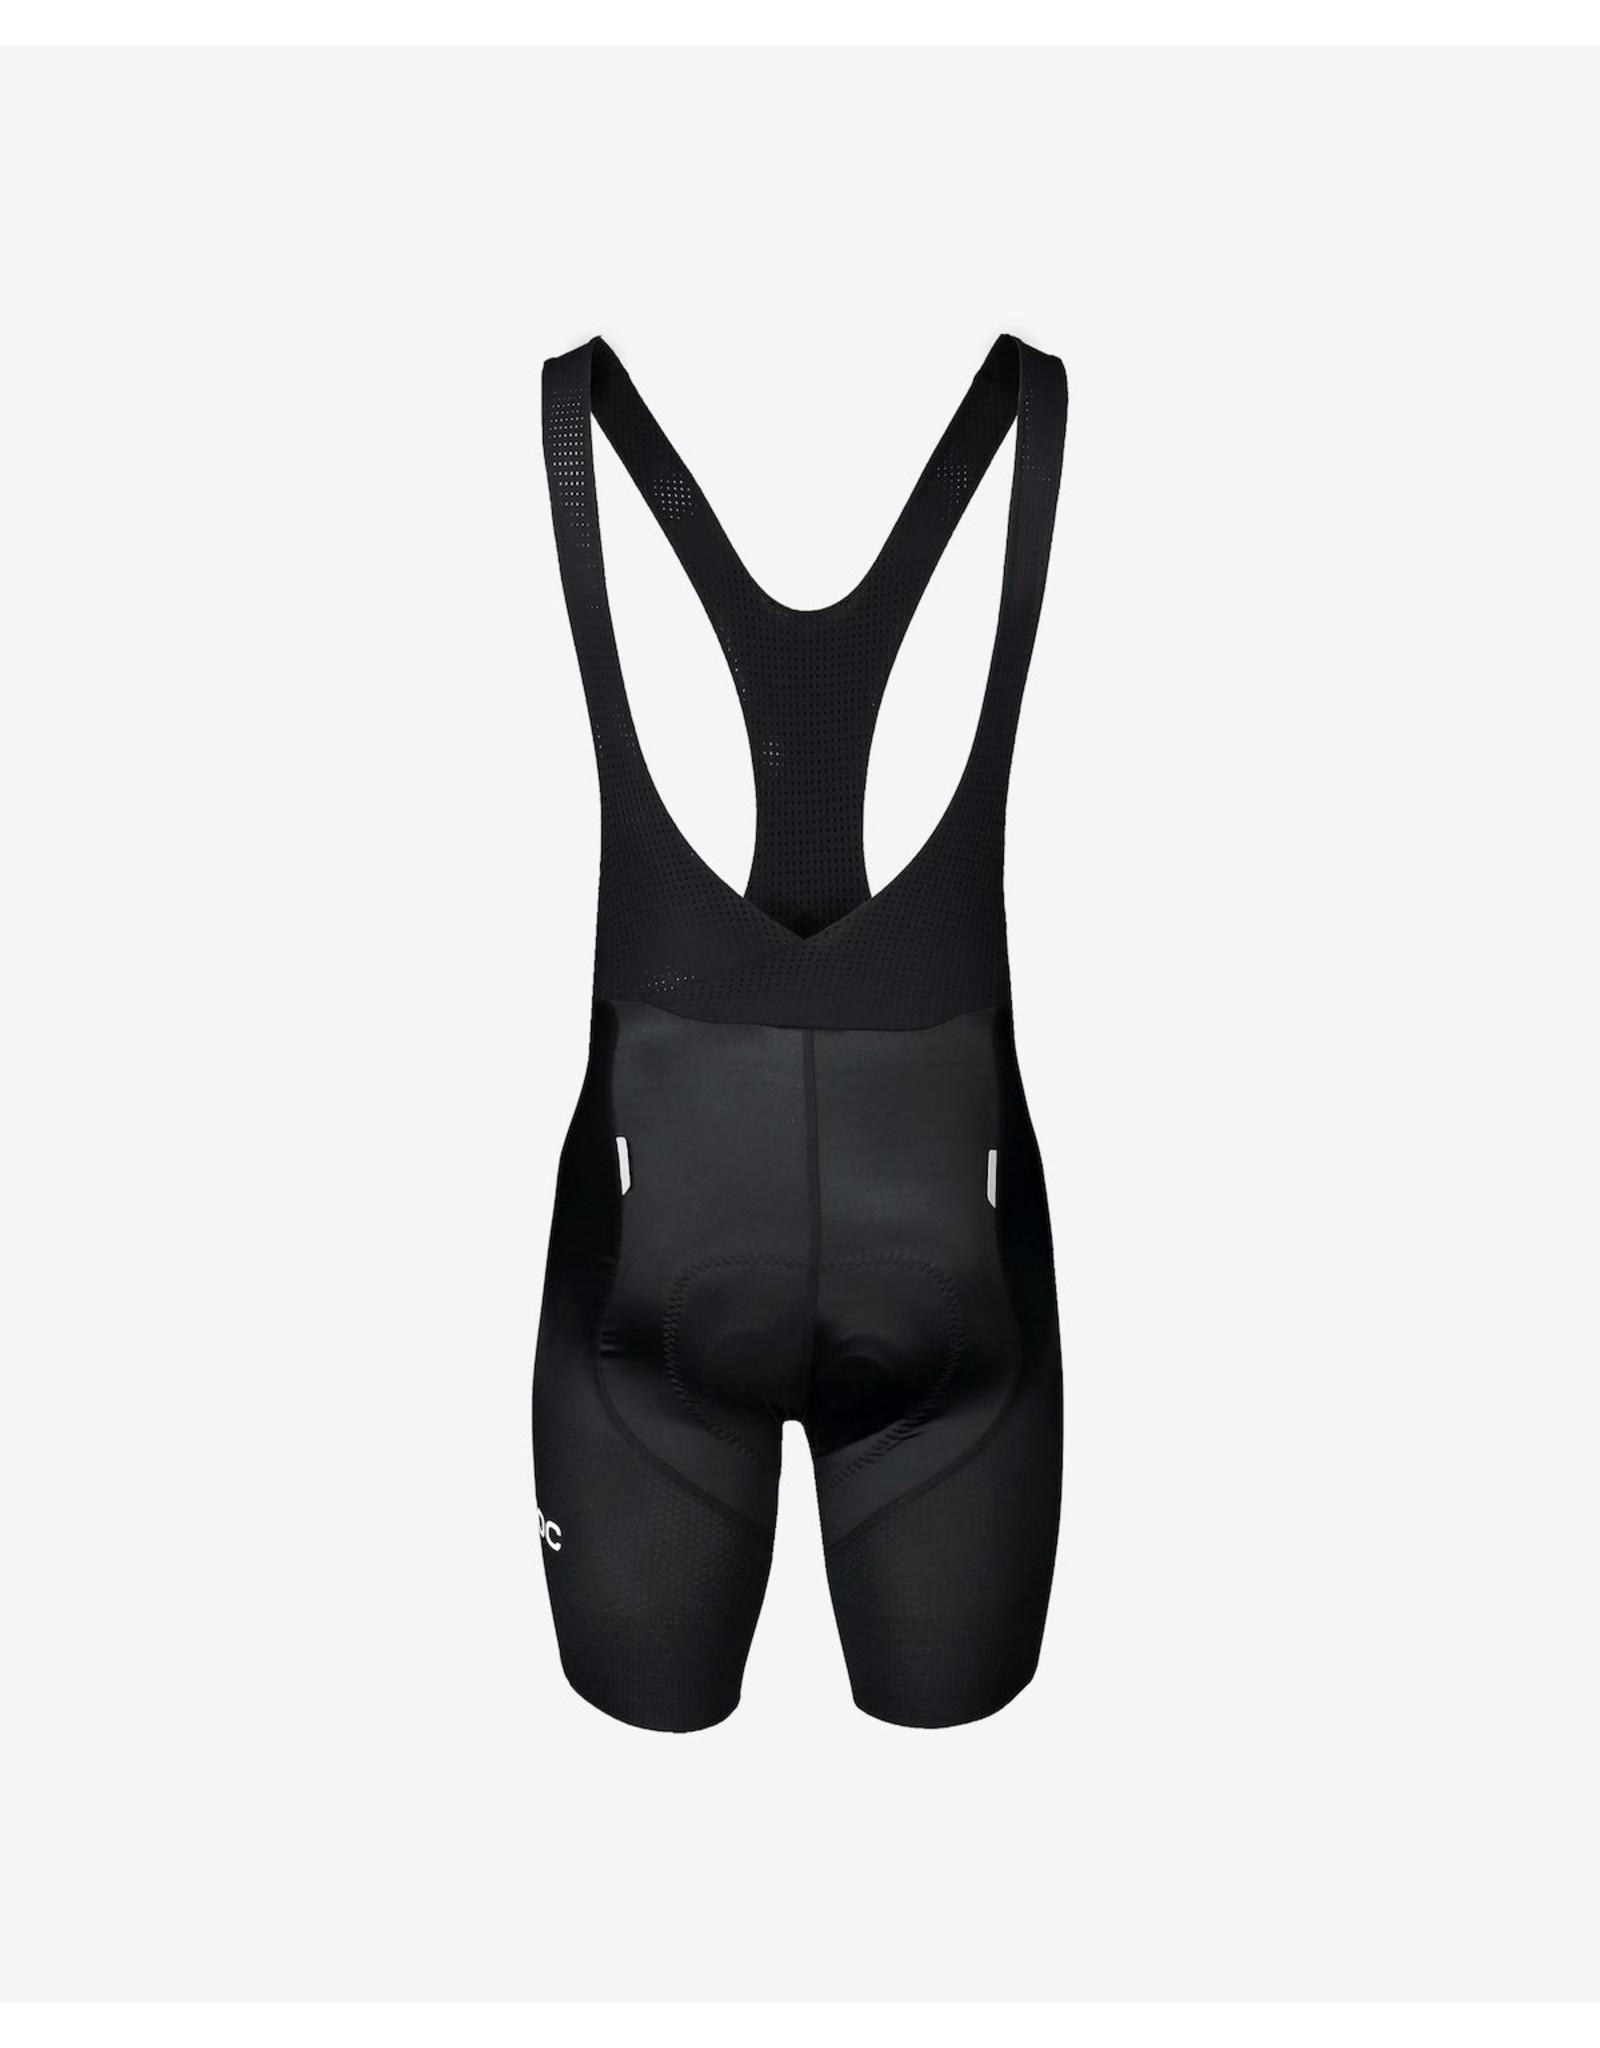 POC POC Women's Ultimate VPDS Bib Shorts